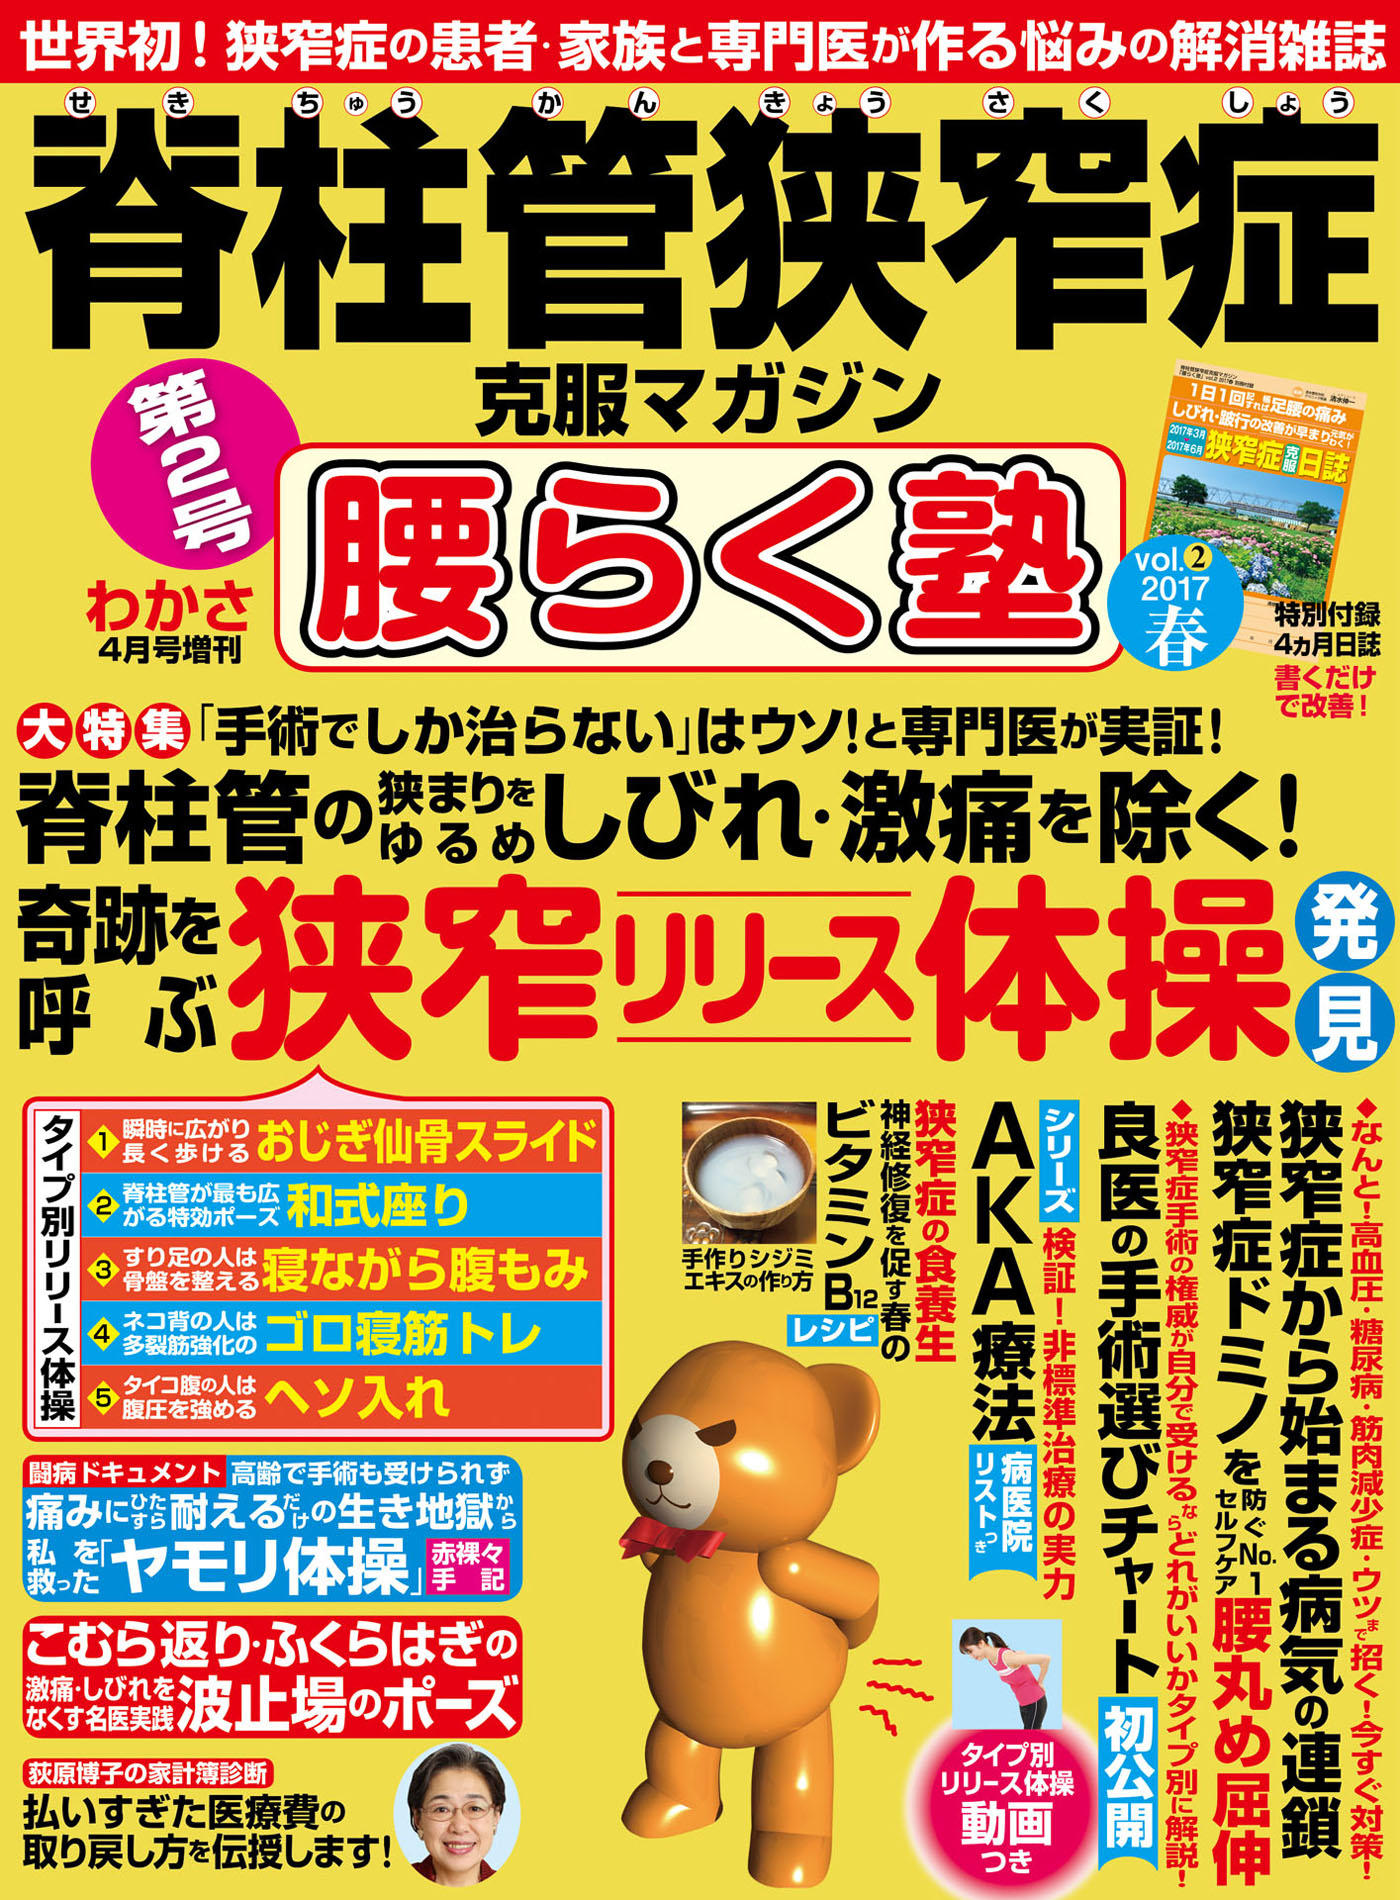 koshiraku_002thumbnail.jpg